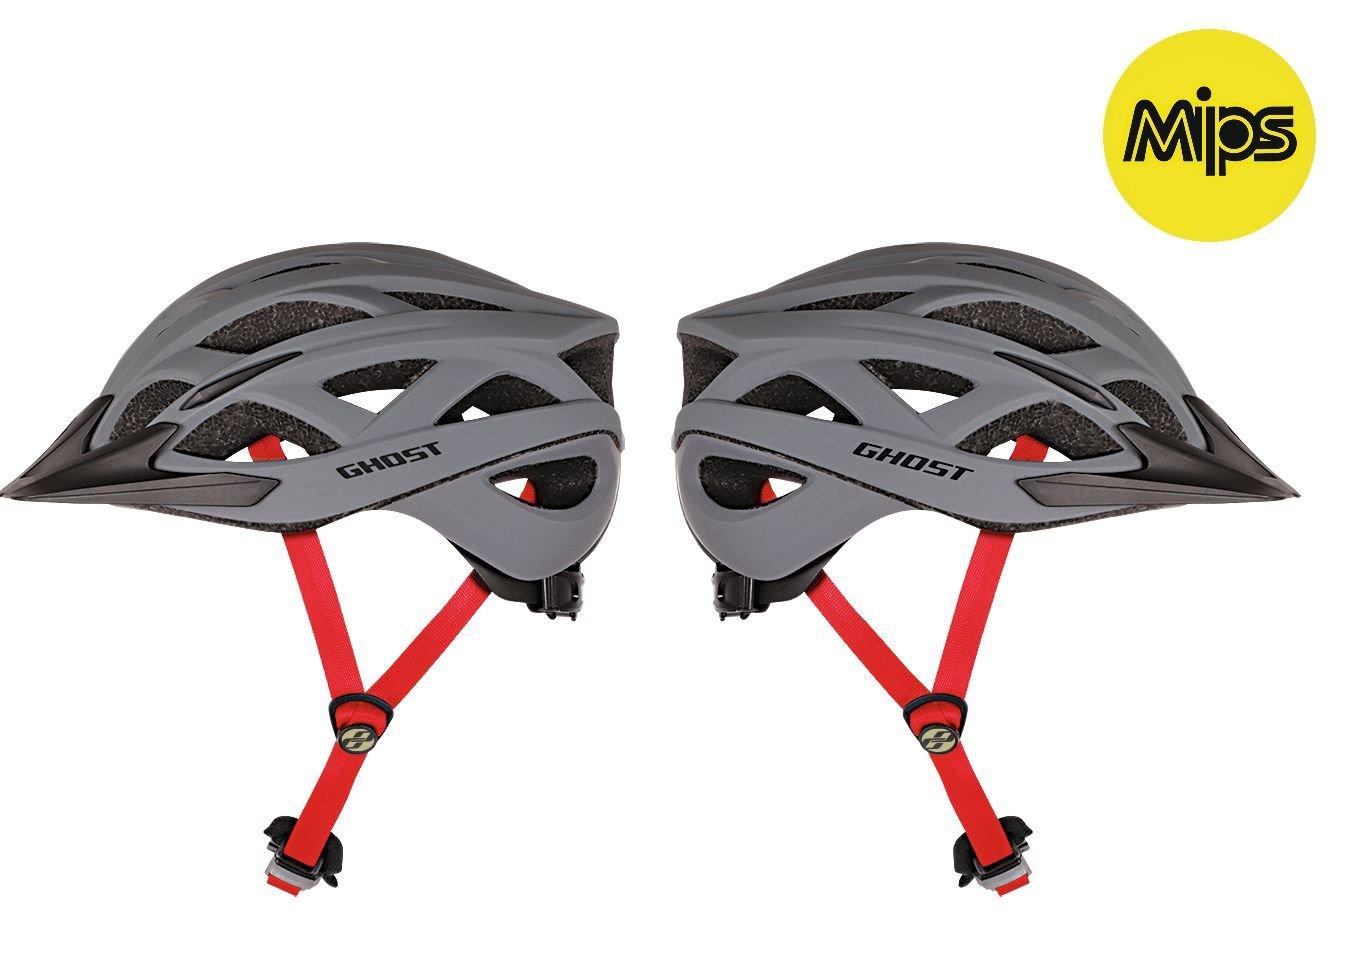 GHOST Helm Classic Plus grau schwarz rot